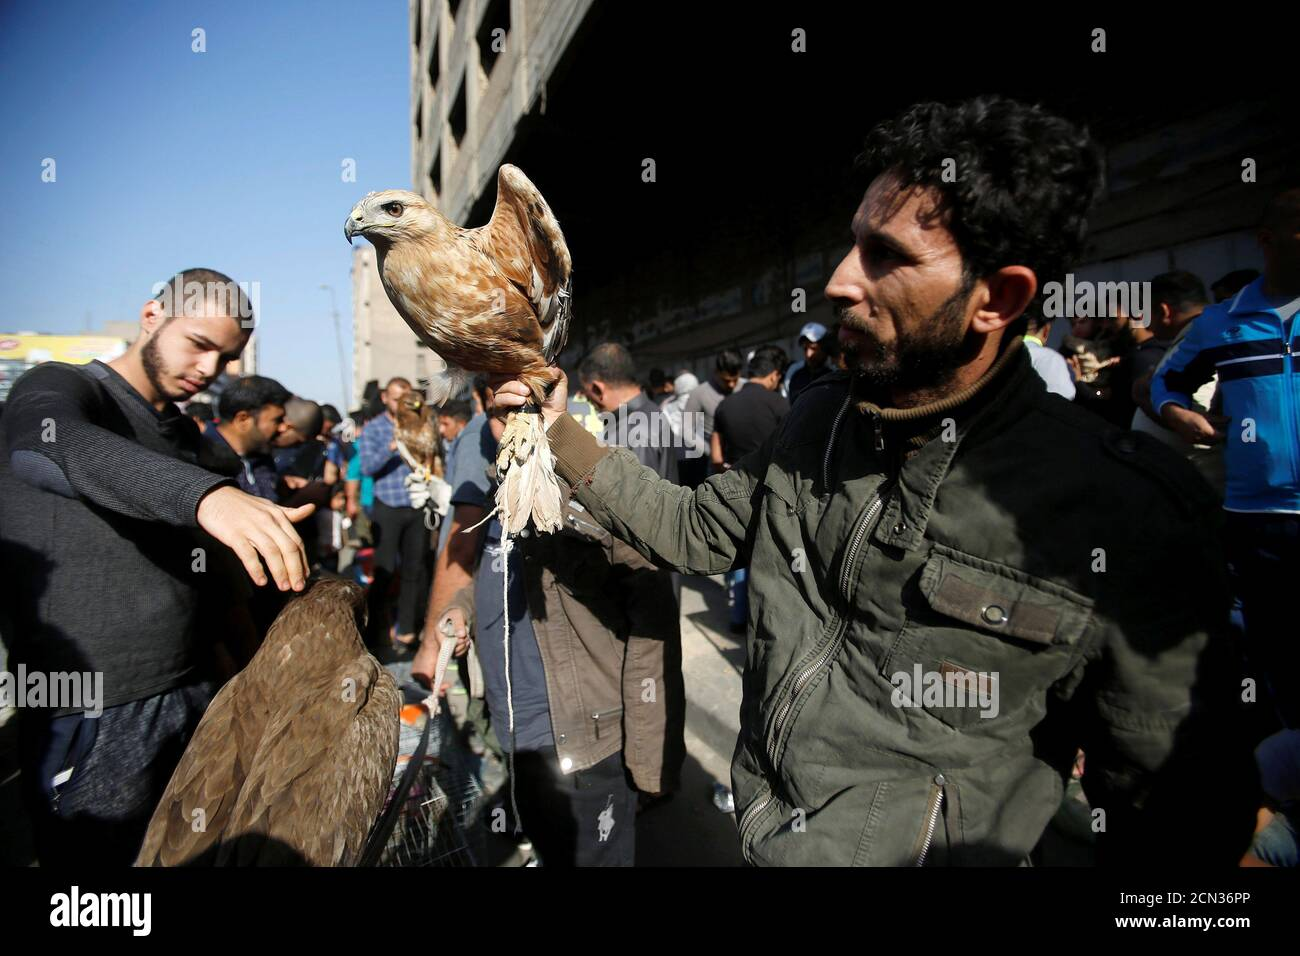 A man sells birds at the Ghazal pet market in Baghdad, Iraq November 17, 2017. REUTERS/Khalid Al-Mousily Stock Photo